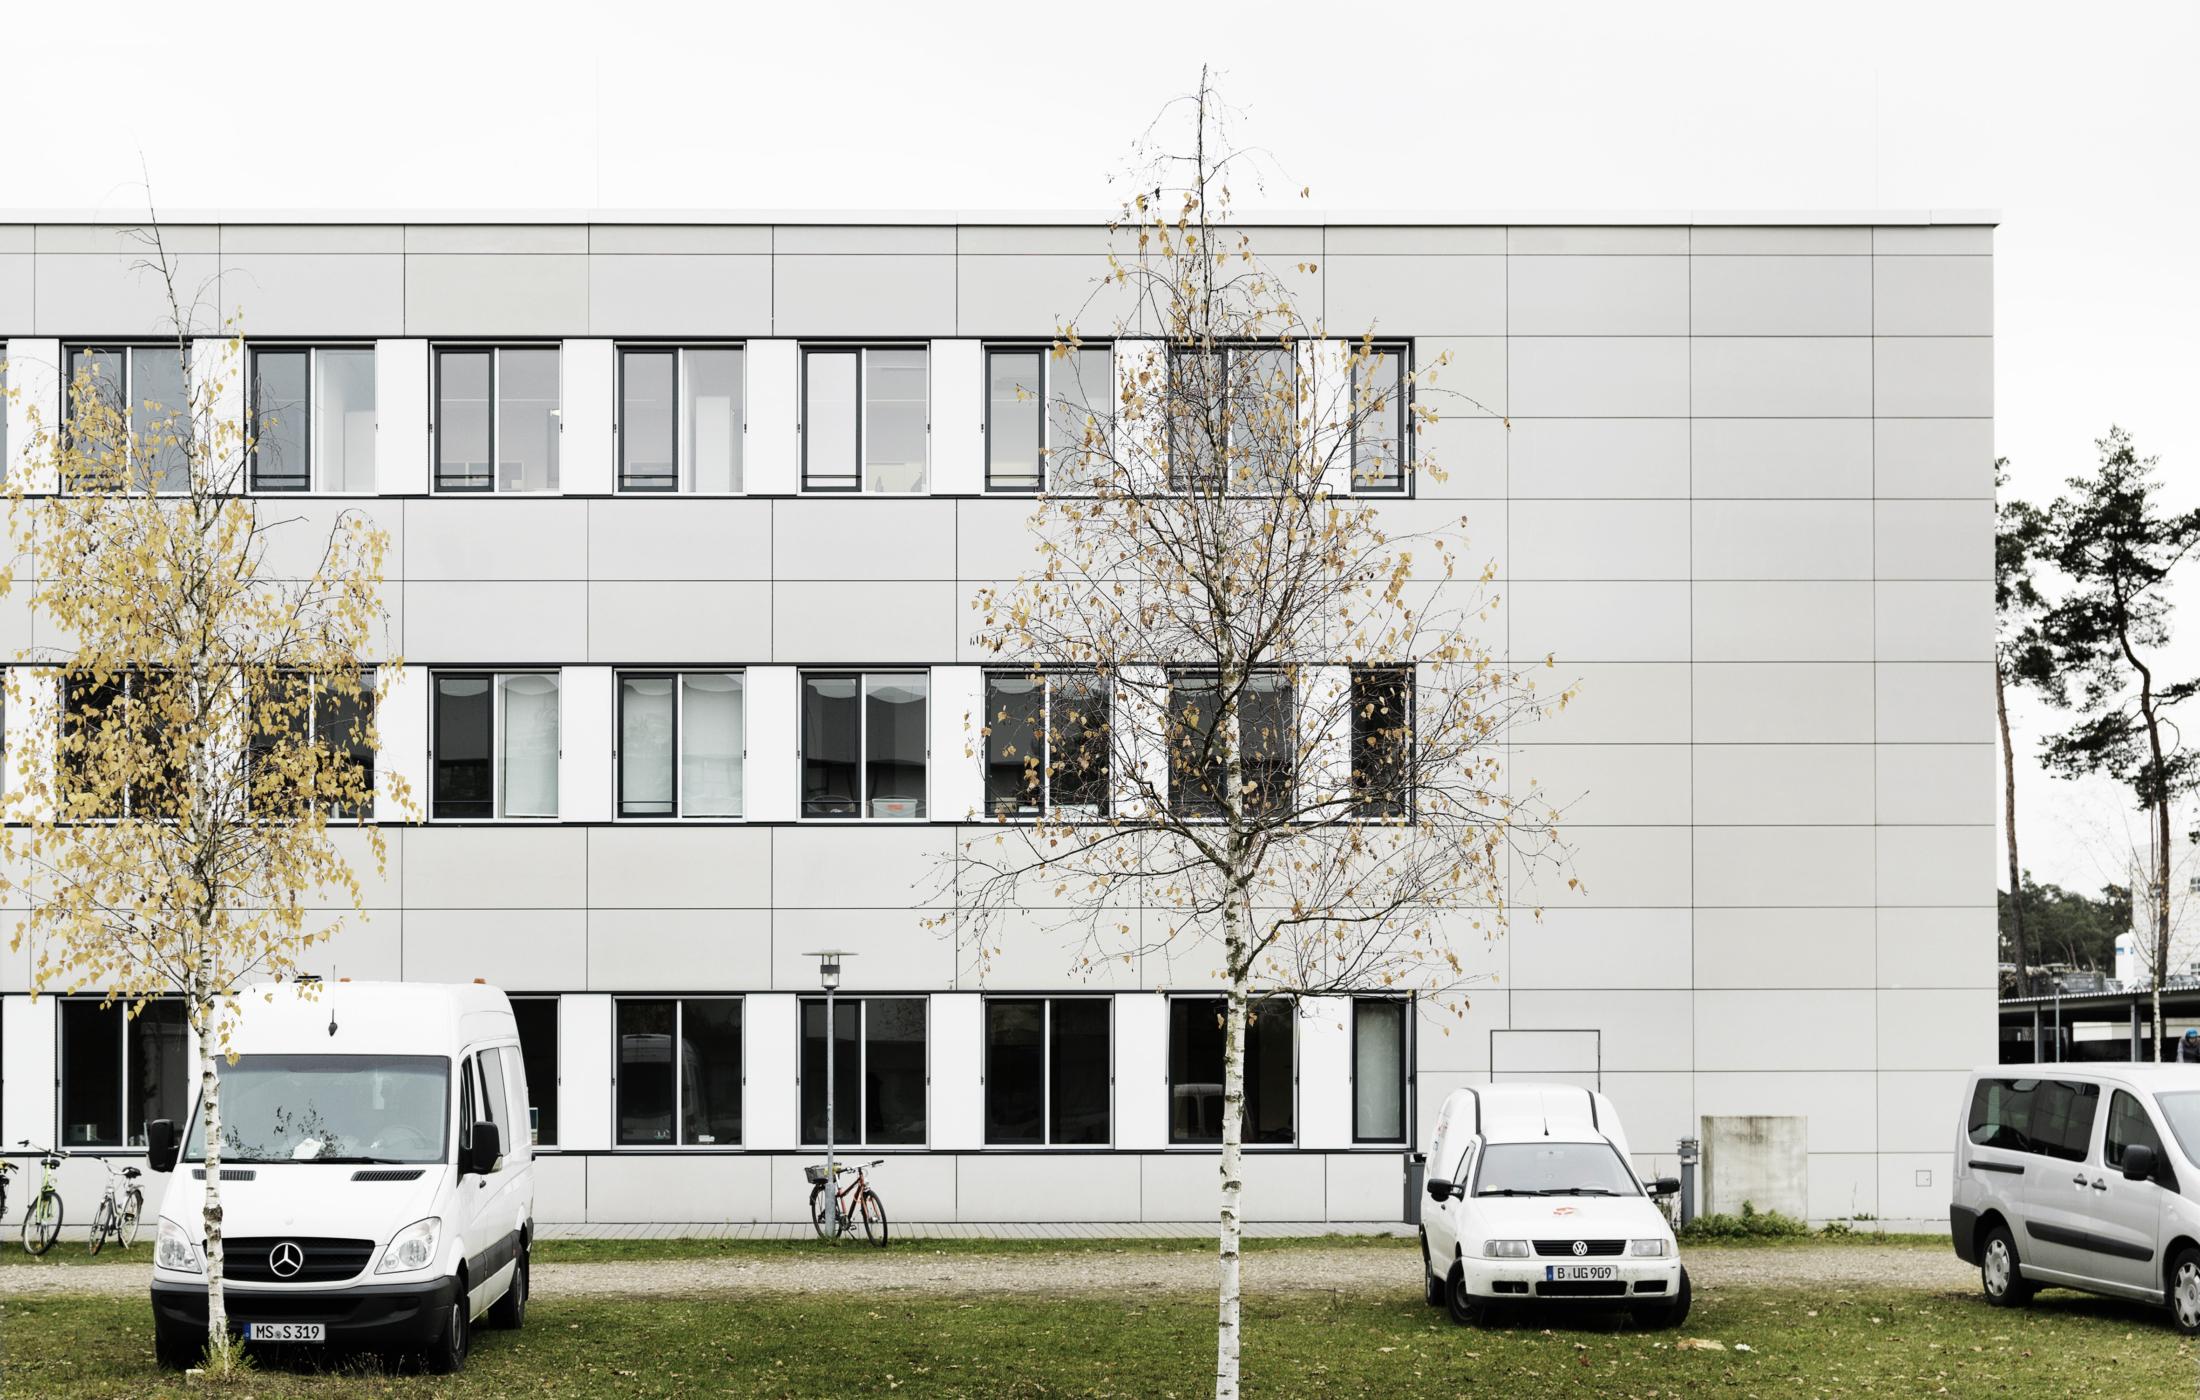 Architekt Erlangen Nürnberg: Universität Erlangen-Nürnberg • Rieder Group Austria